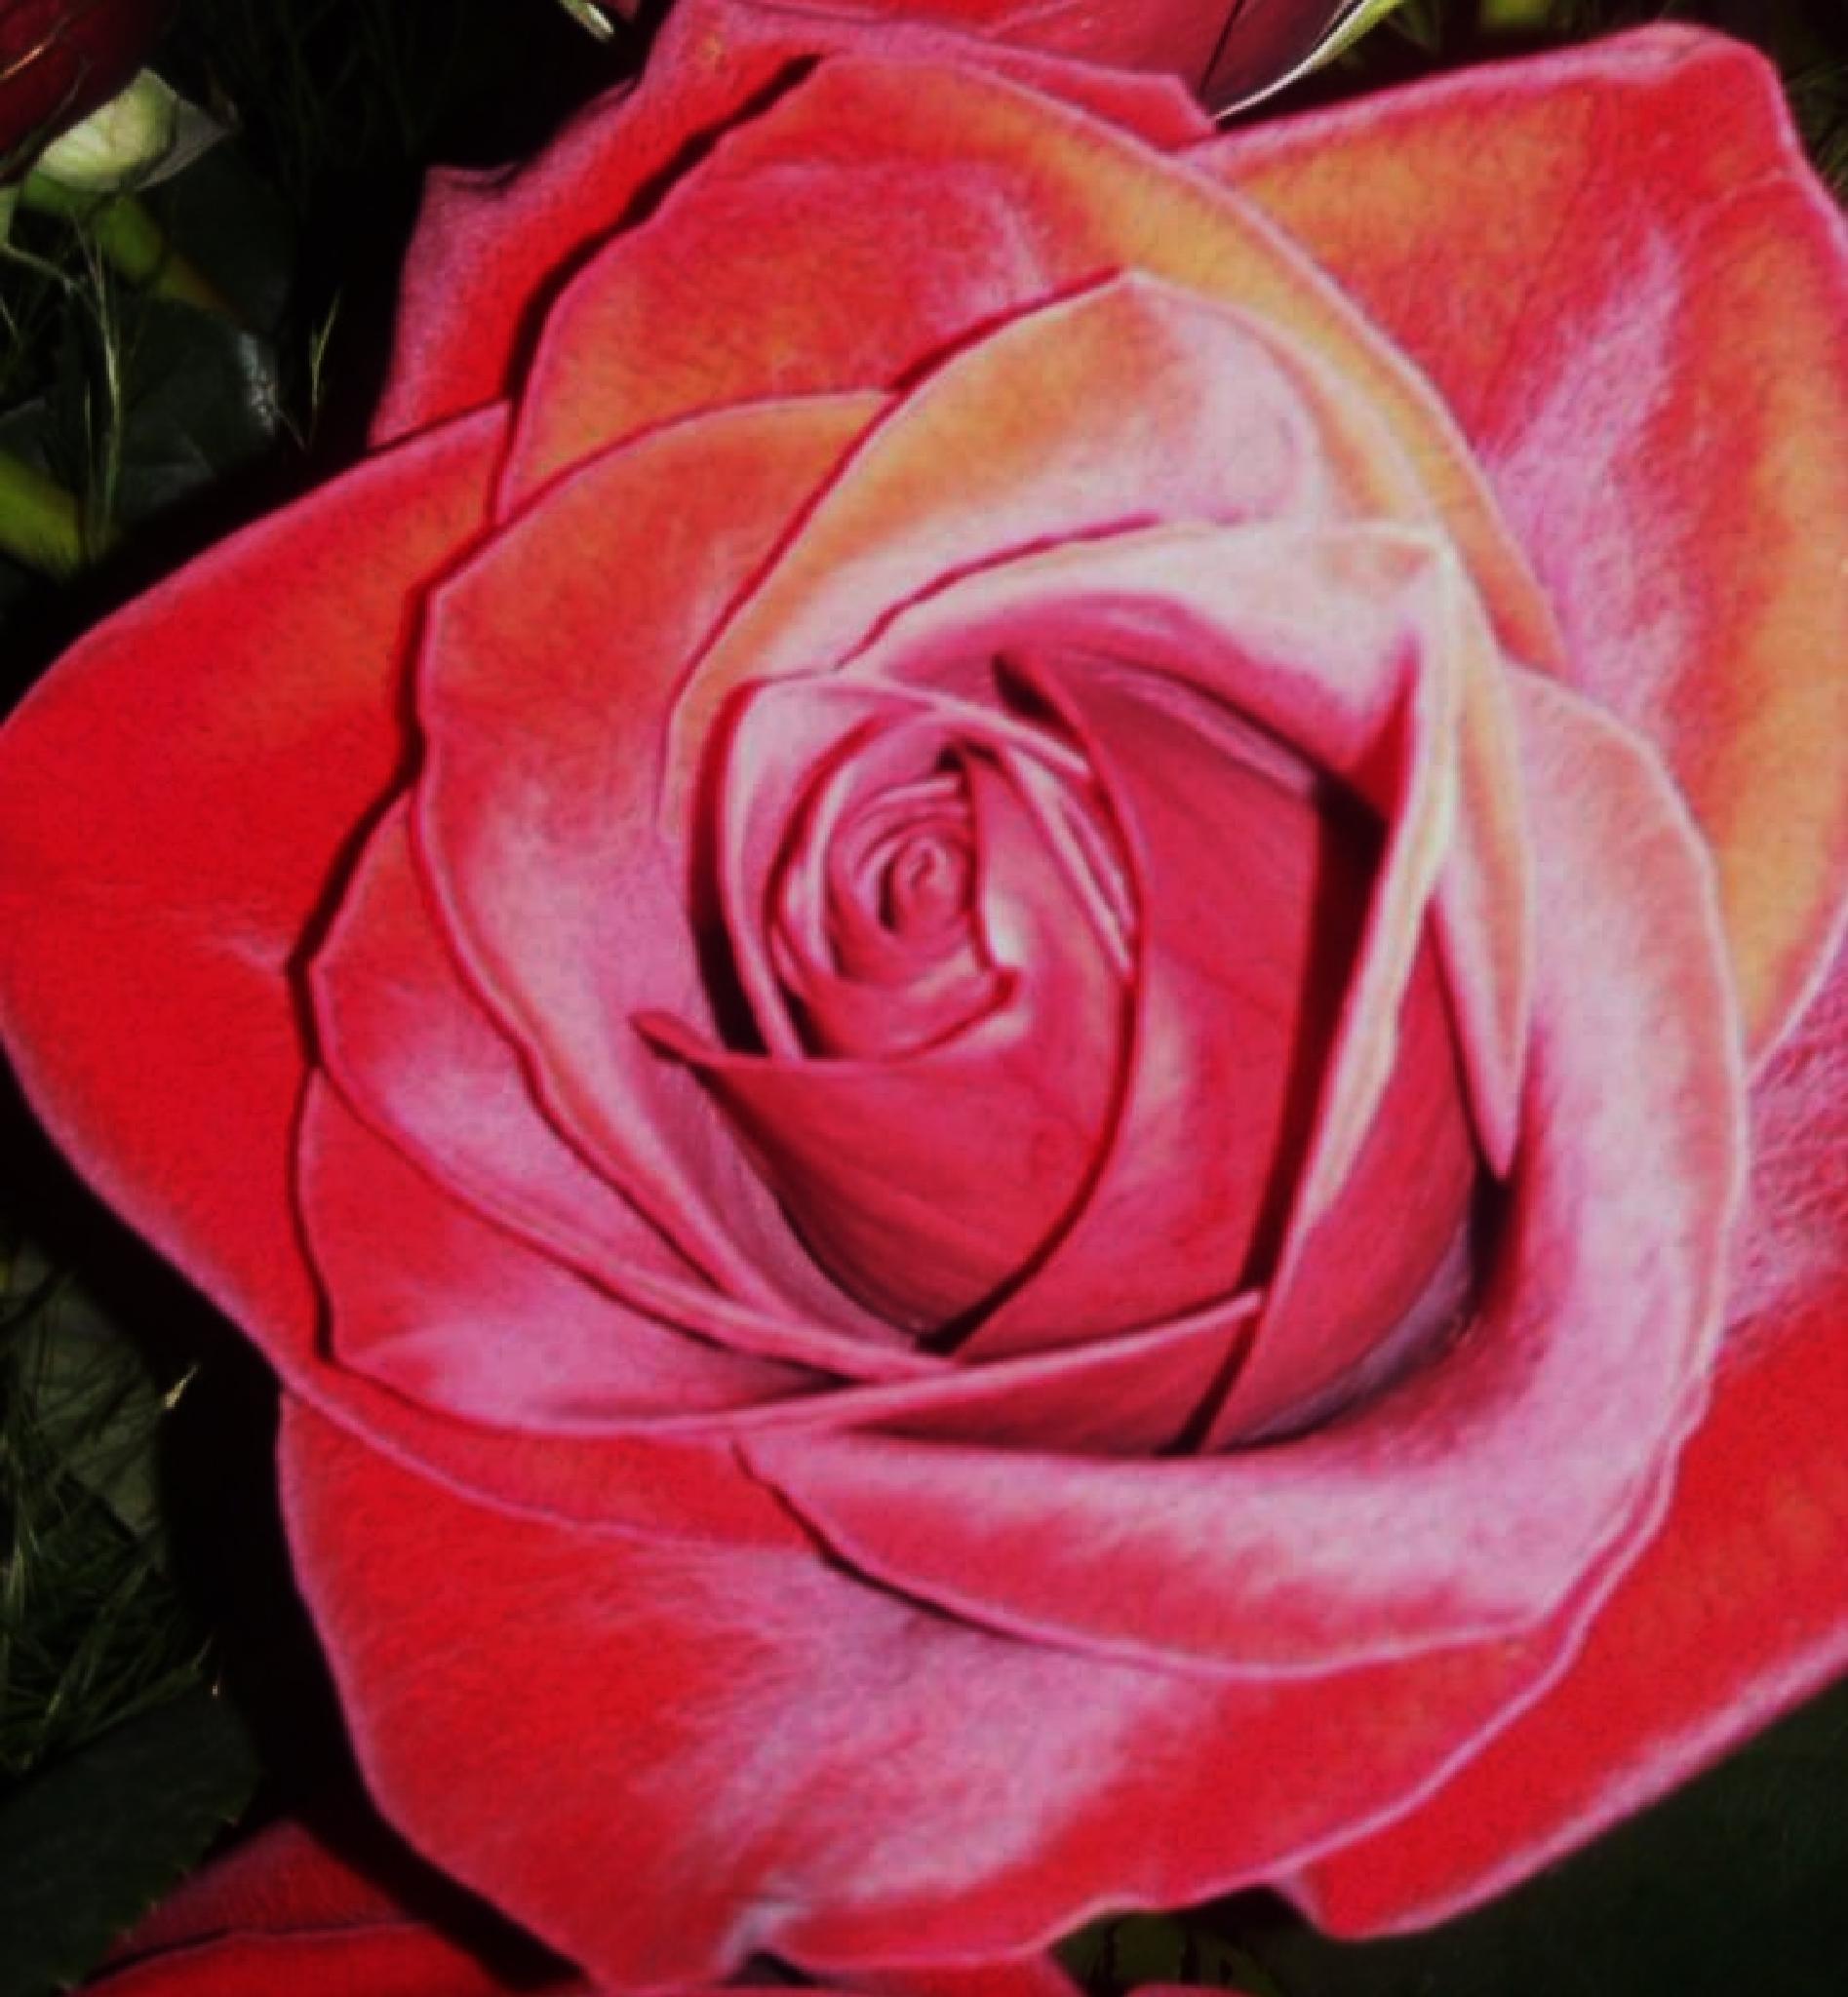 rose by santee57